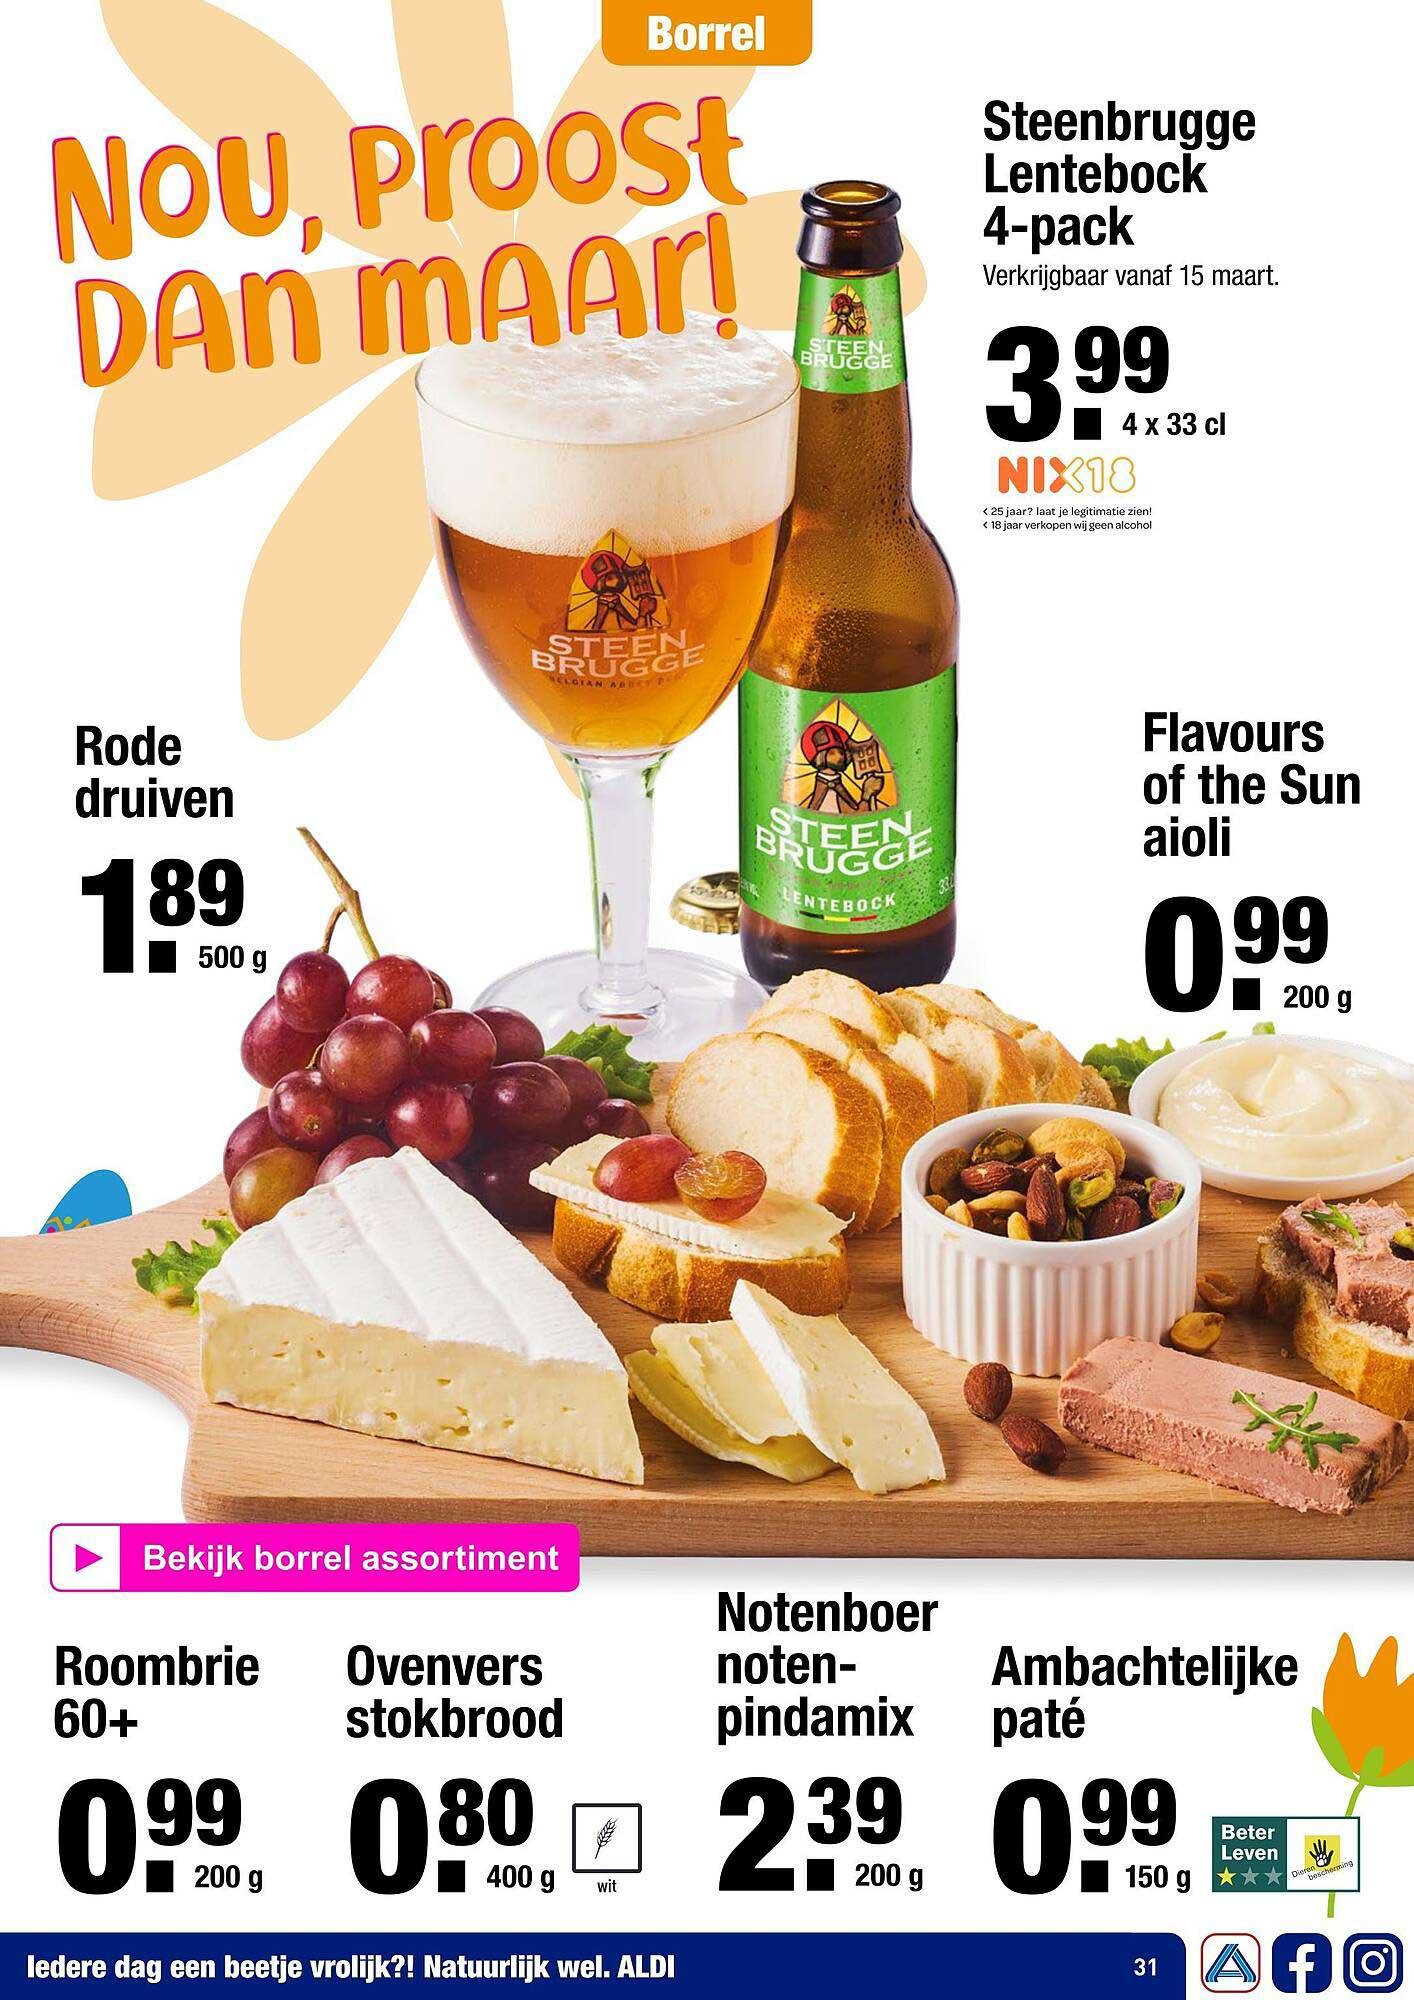 ALDI Rode Druiven, Steenbrugge Lentebock 4-Pack, Flavours Of The Sun Aioli, Roombrie 60+, Ovenvers Stokbrood, Notenboer Notenpindamix Of Ambachtelijke Paté